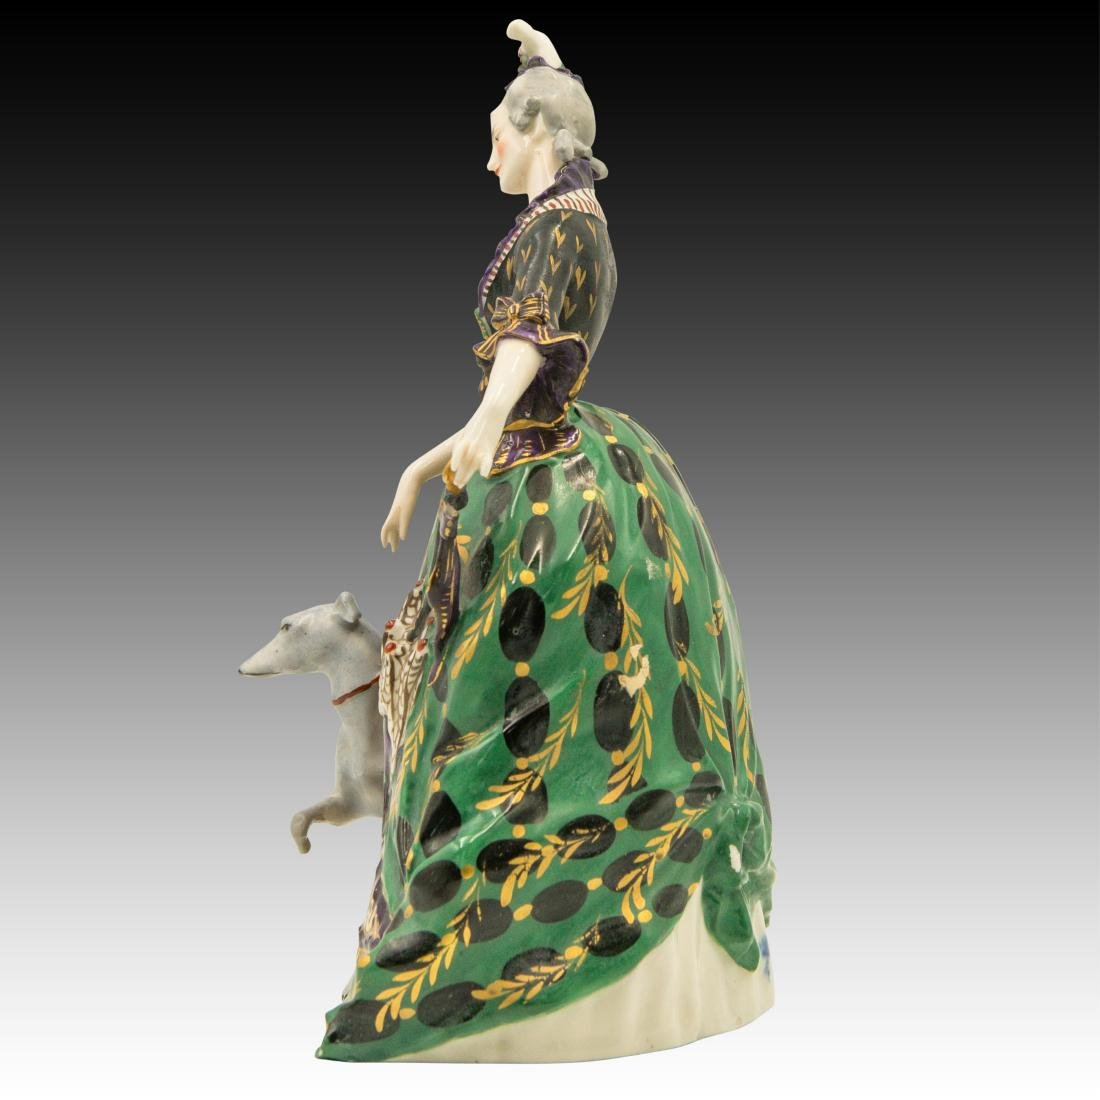 Polychrome Figurine Woman and her Greyhound - 4